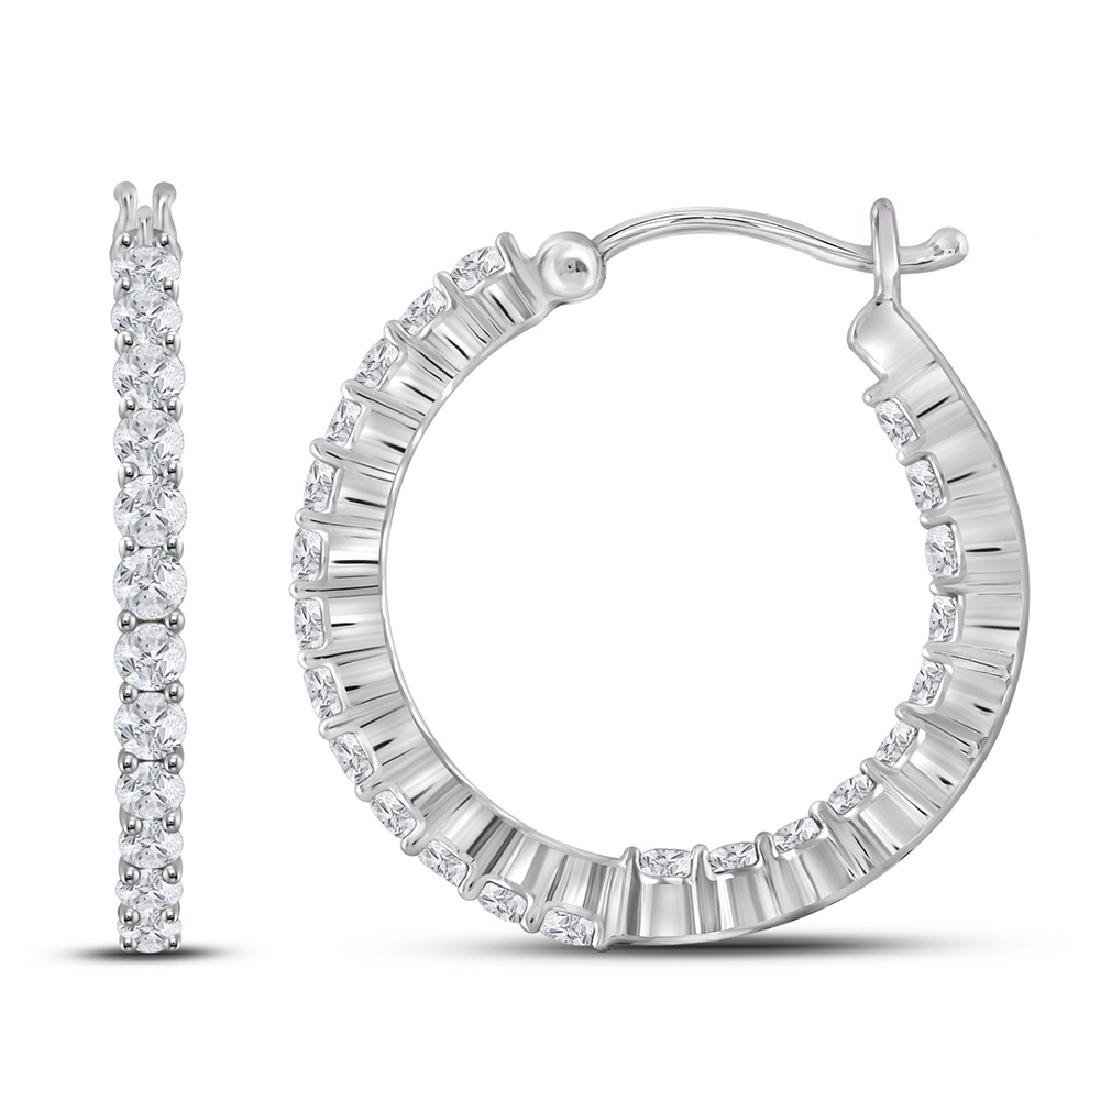 0.99 CTW Diamond Single Row Hoop Earrings 14KT White